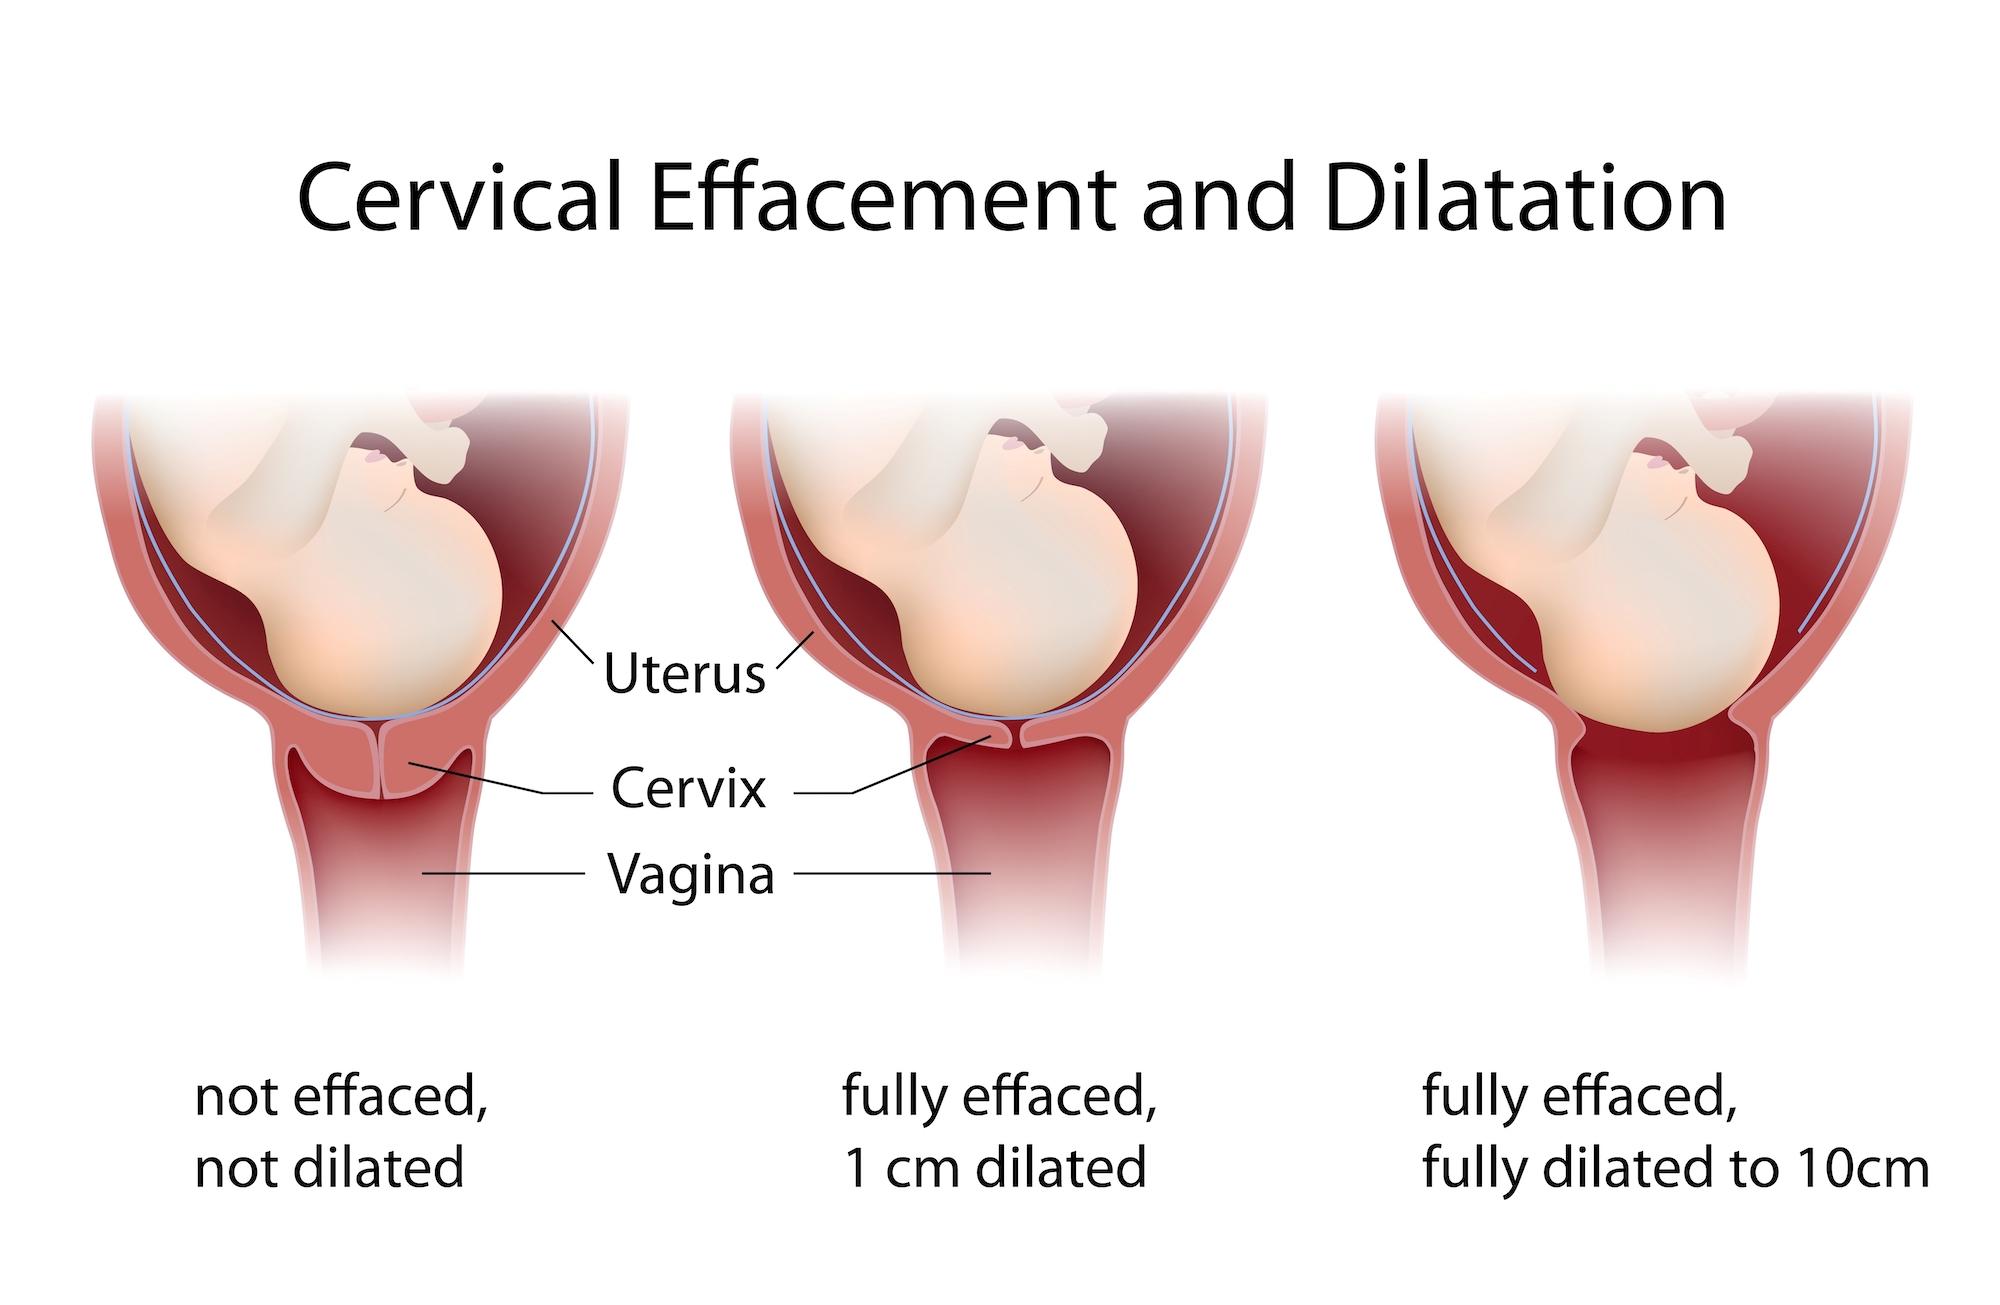 Cervical-Effacement-Dilation-Pregnancy-Chart-jpg